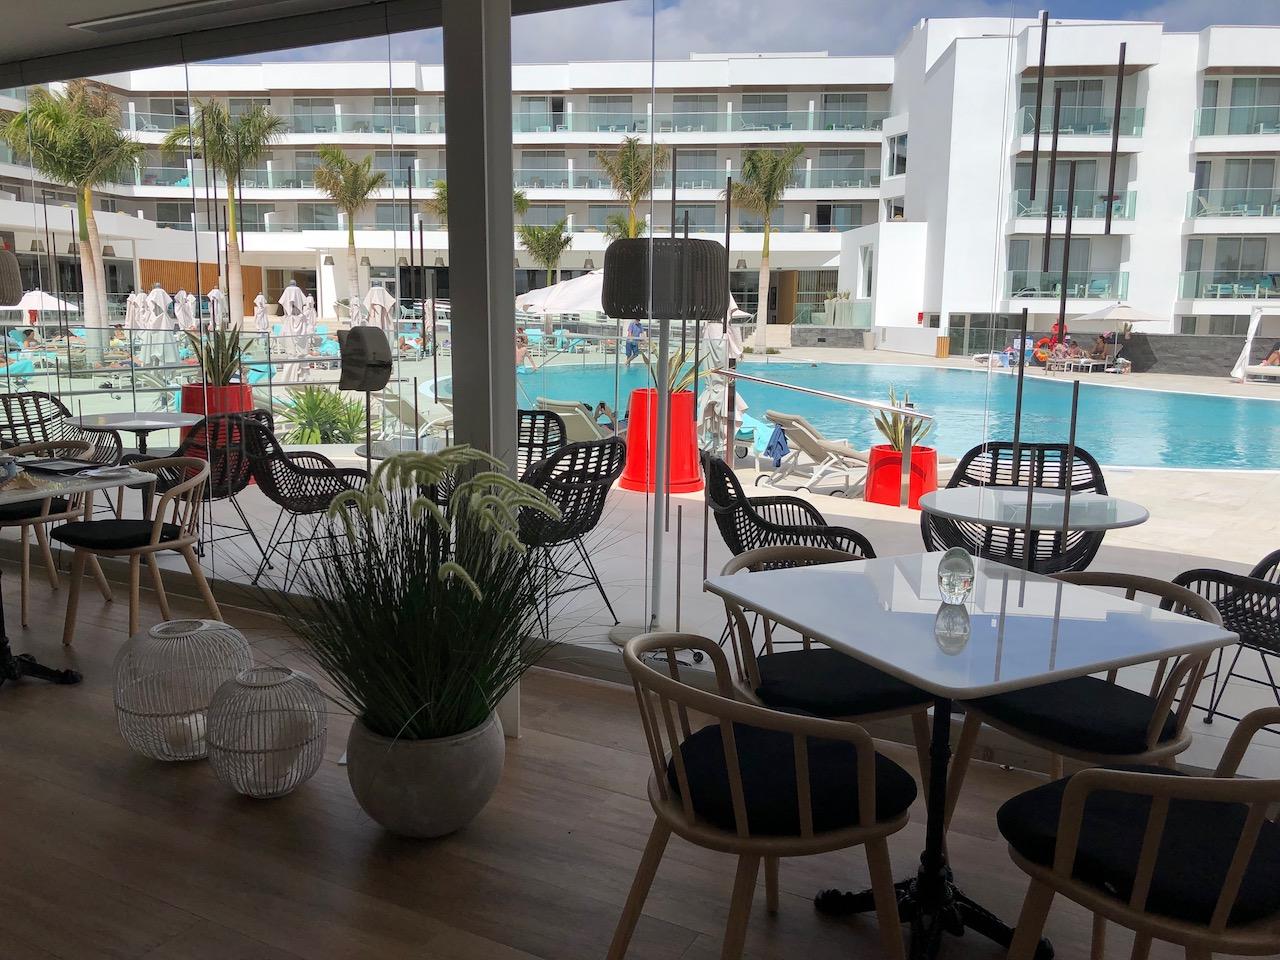 Lava Beach Hotel Aroma Restaurant view